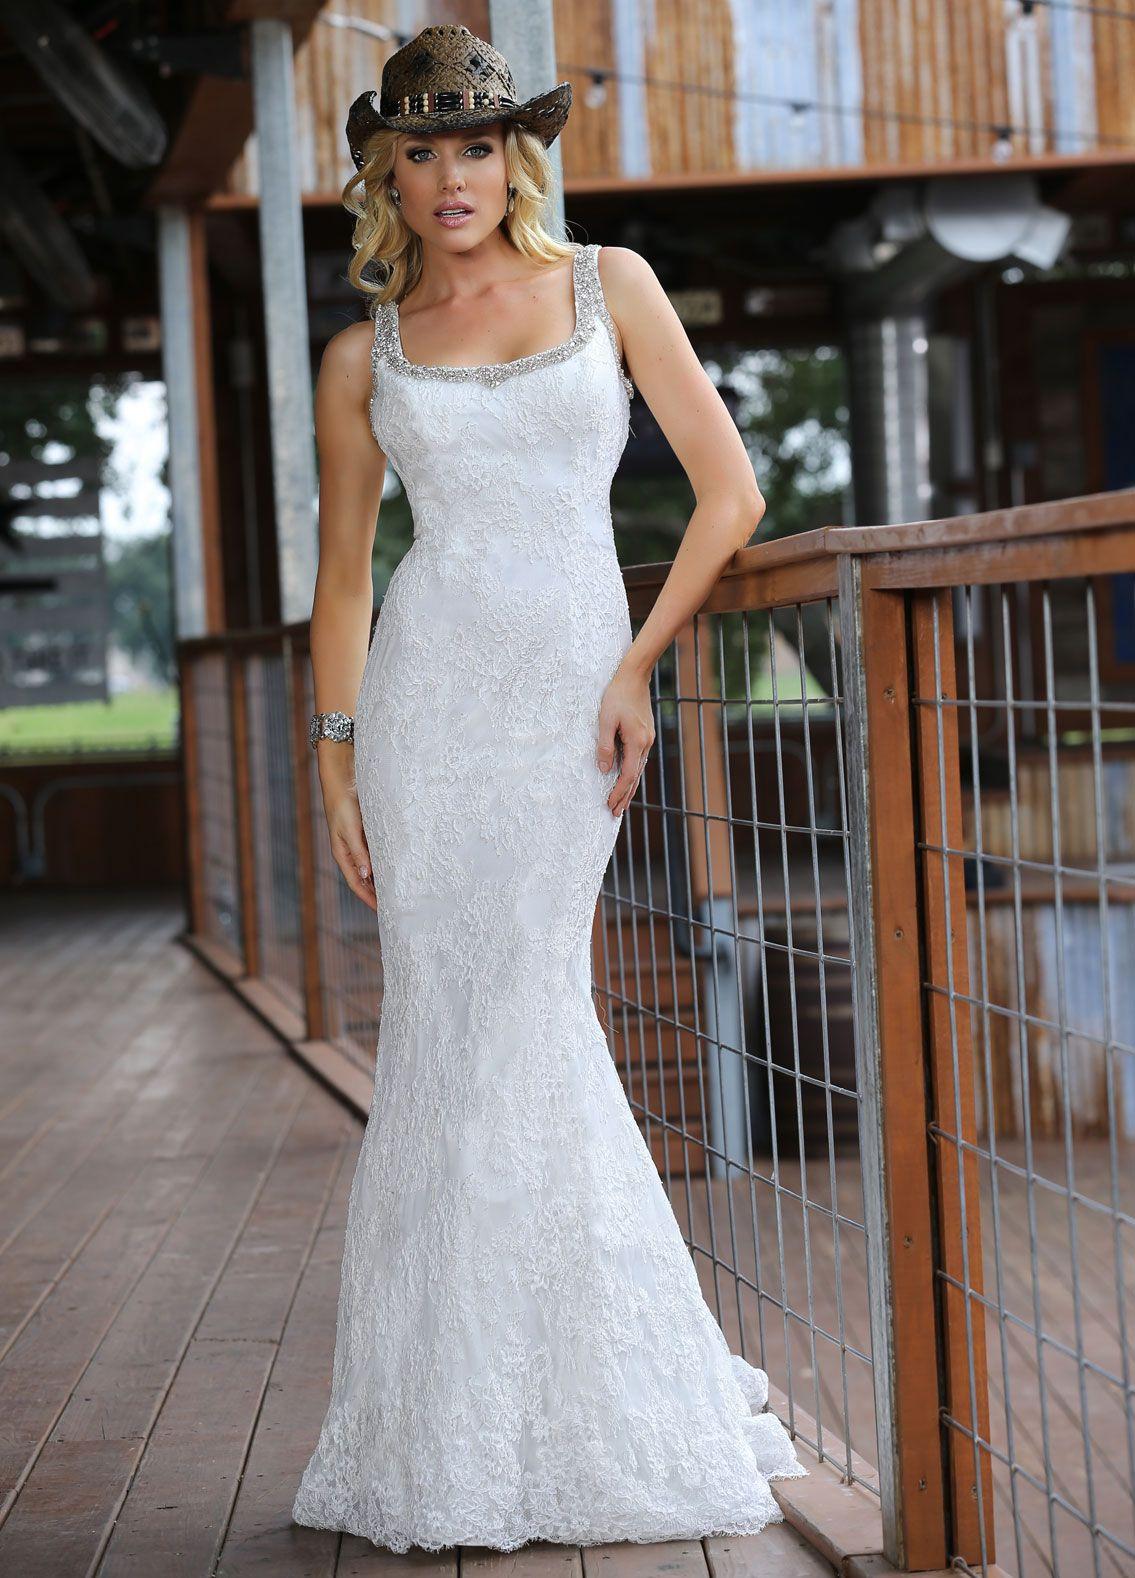 White mermaid wedding dress  Wishesbridal Backless Spaghetti Straps Lace Trumpet Mermaid